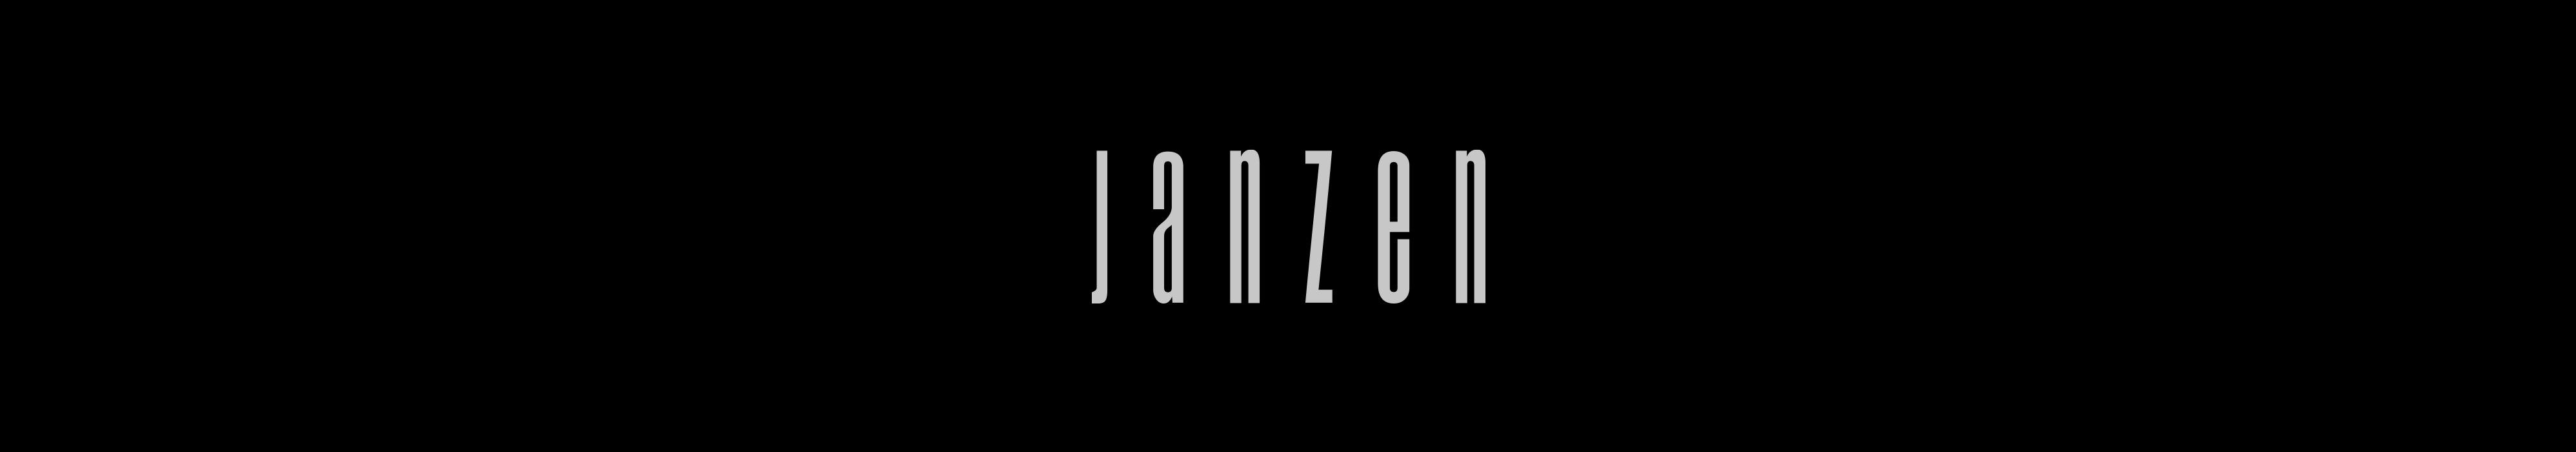 Janzen cosmetics